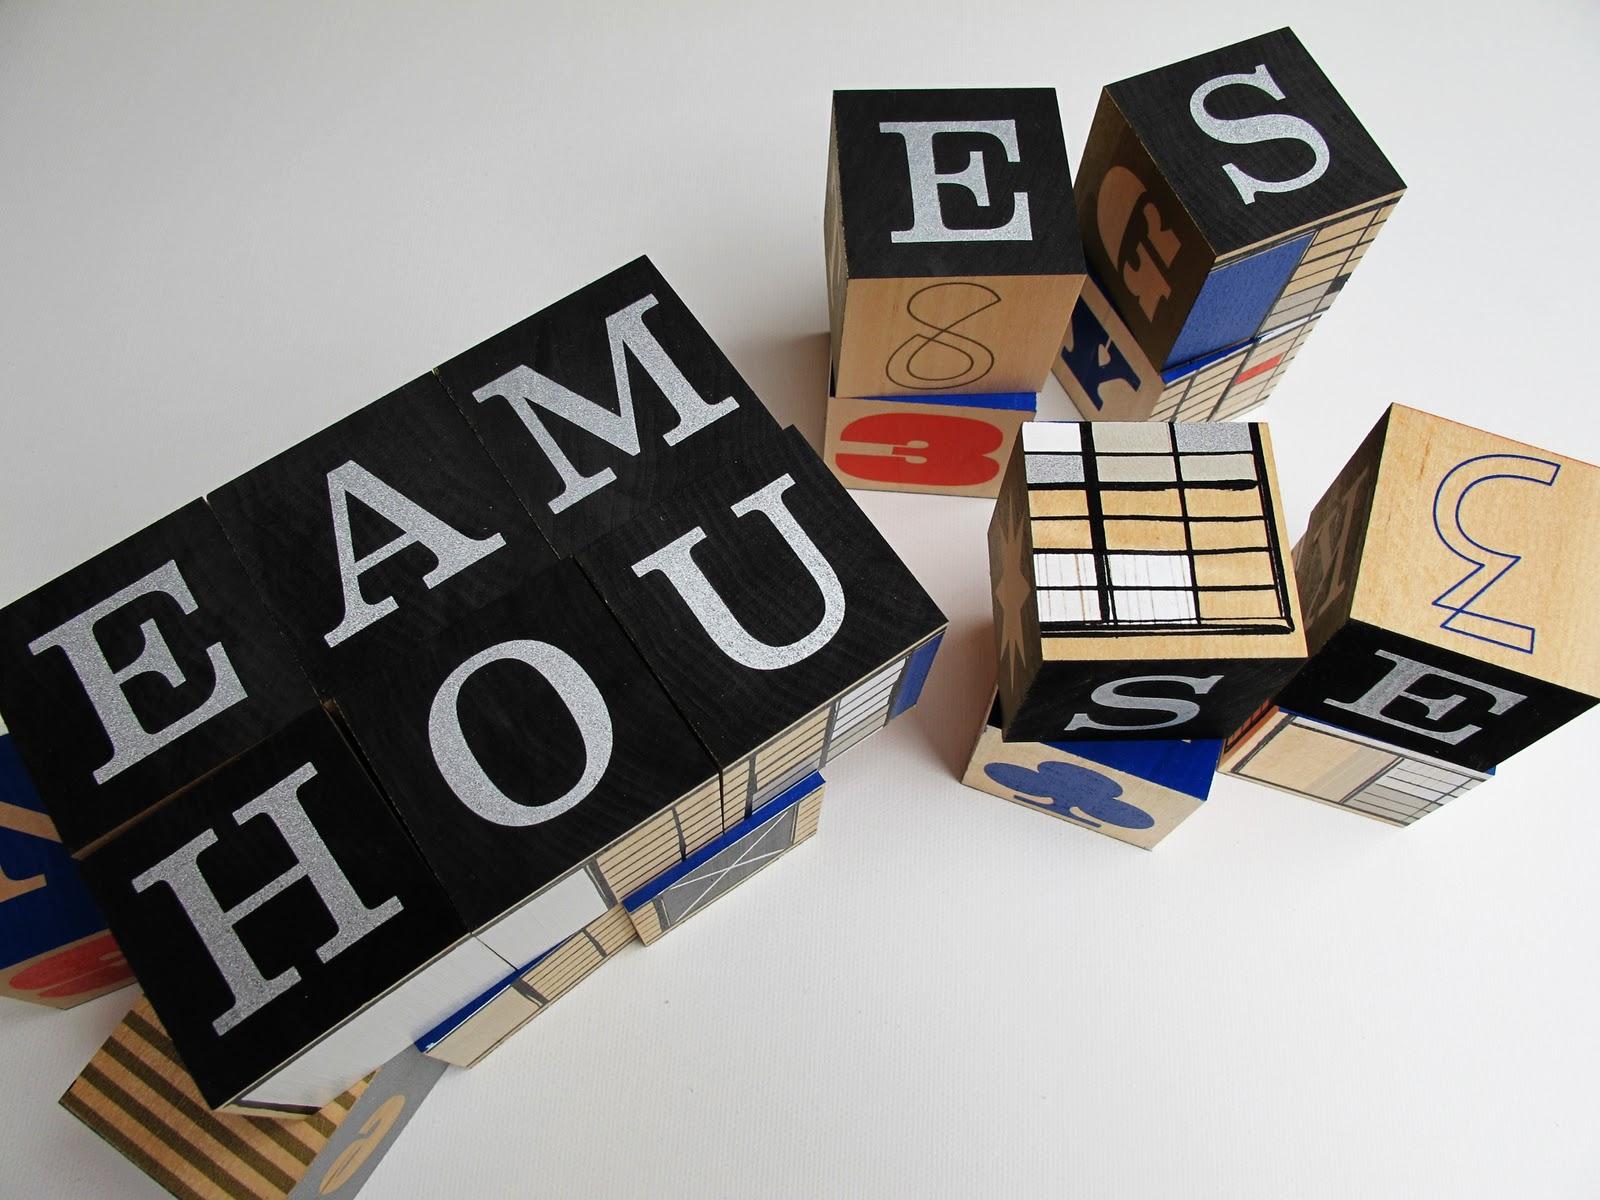 House industries eames font pack torrent rar for House industries eames